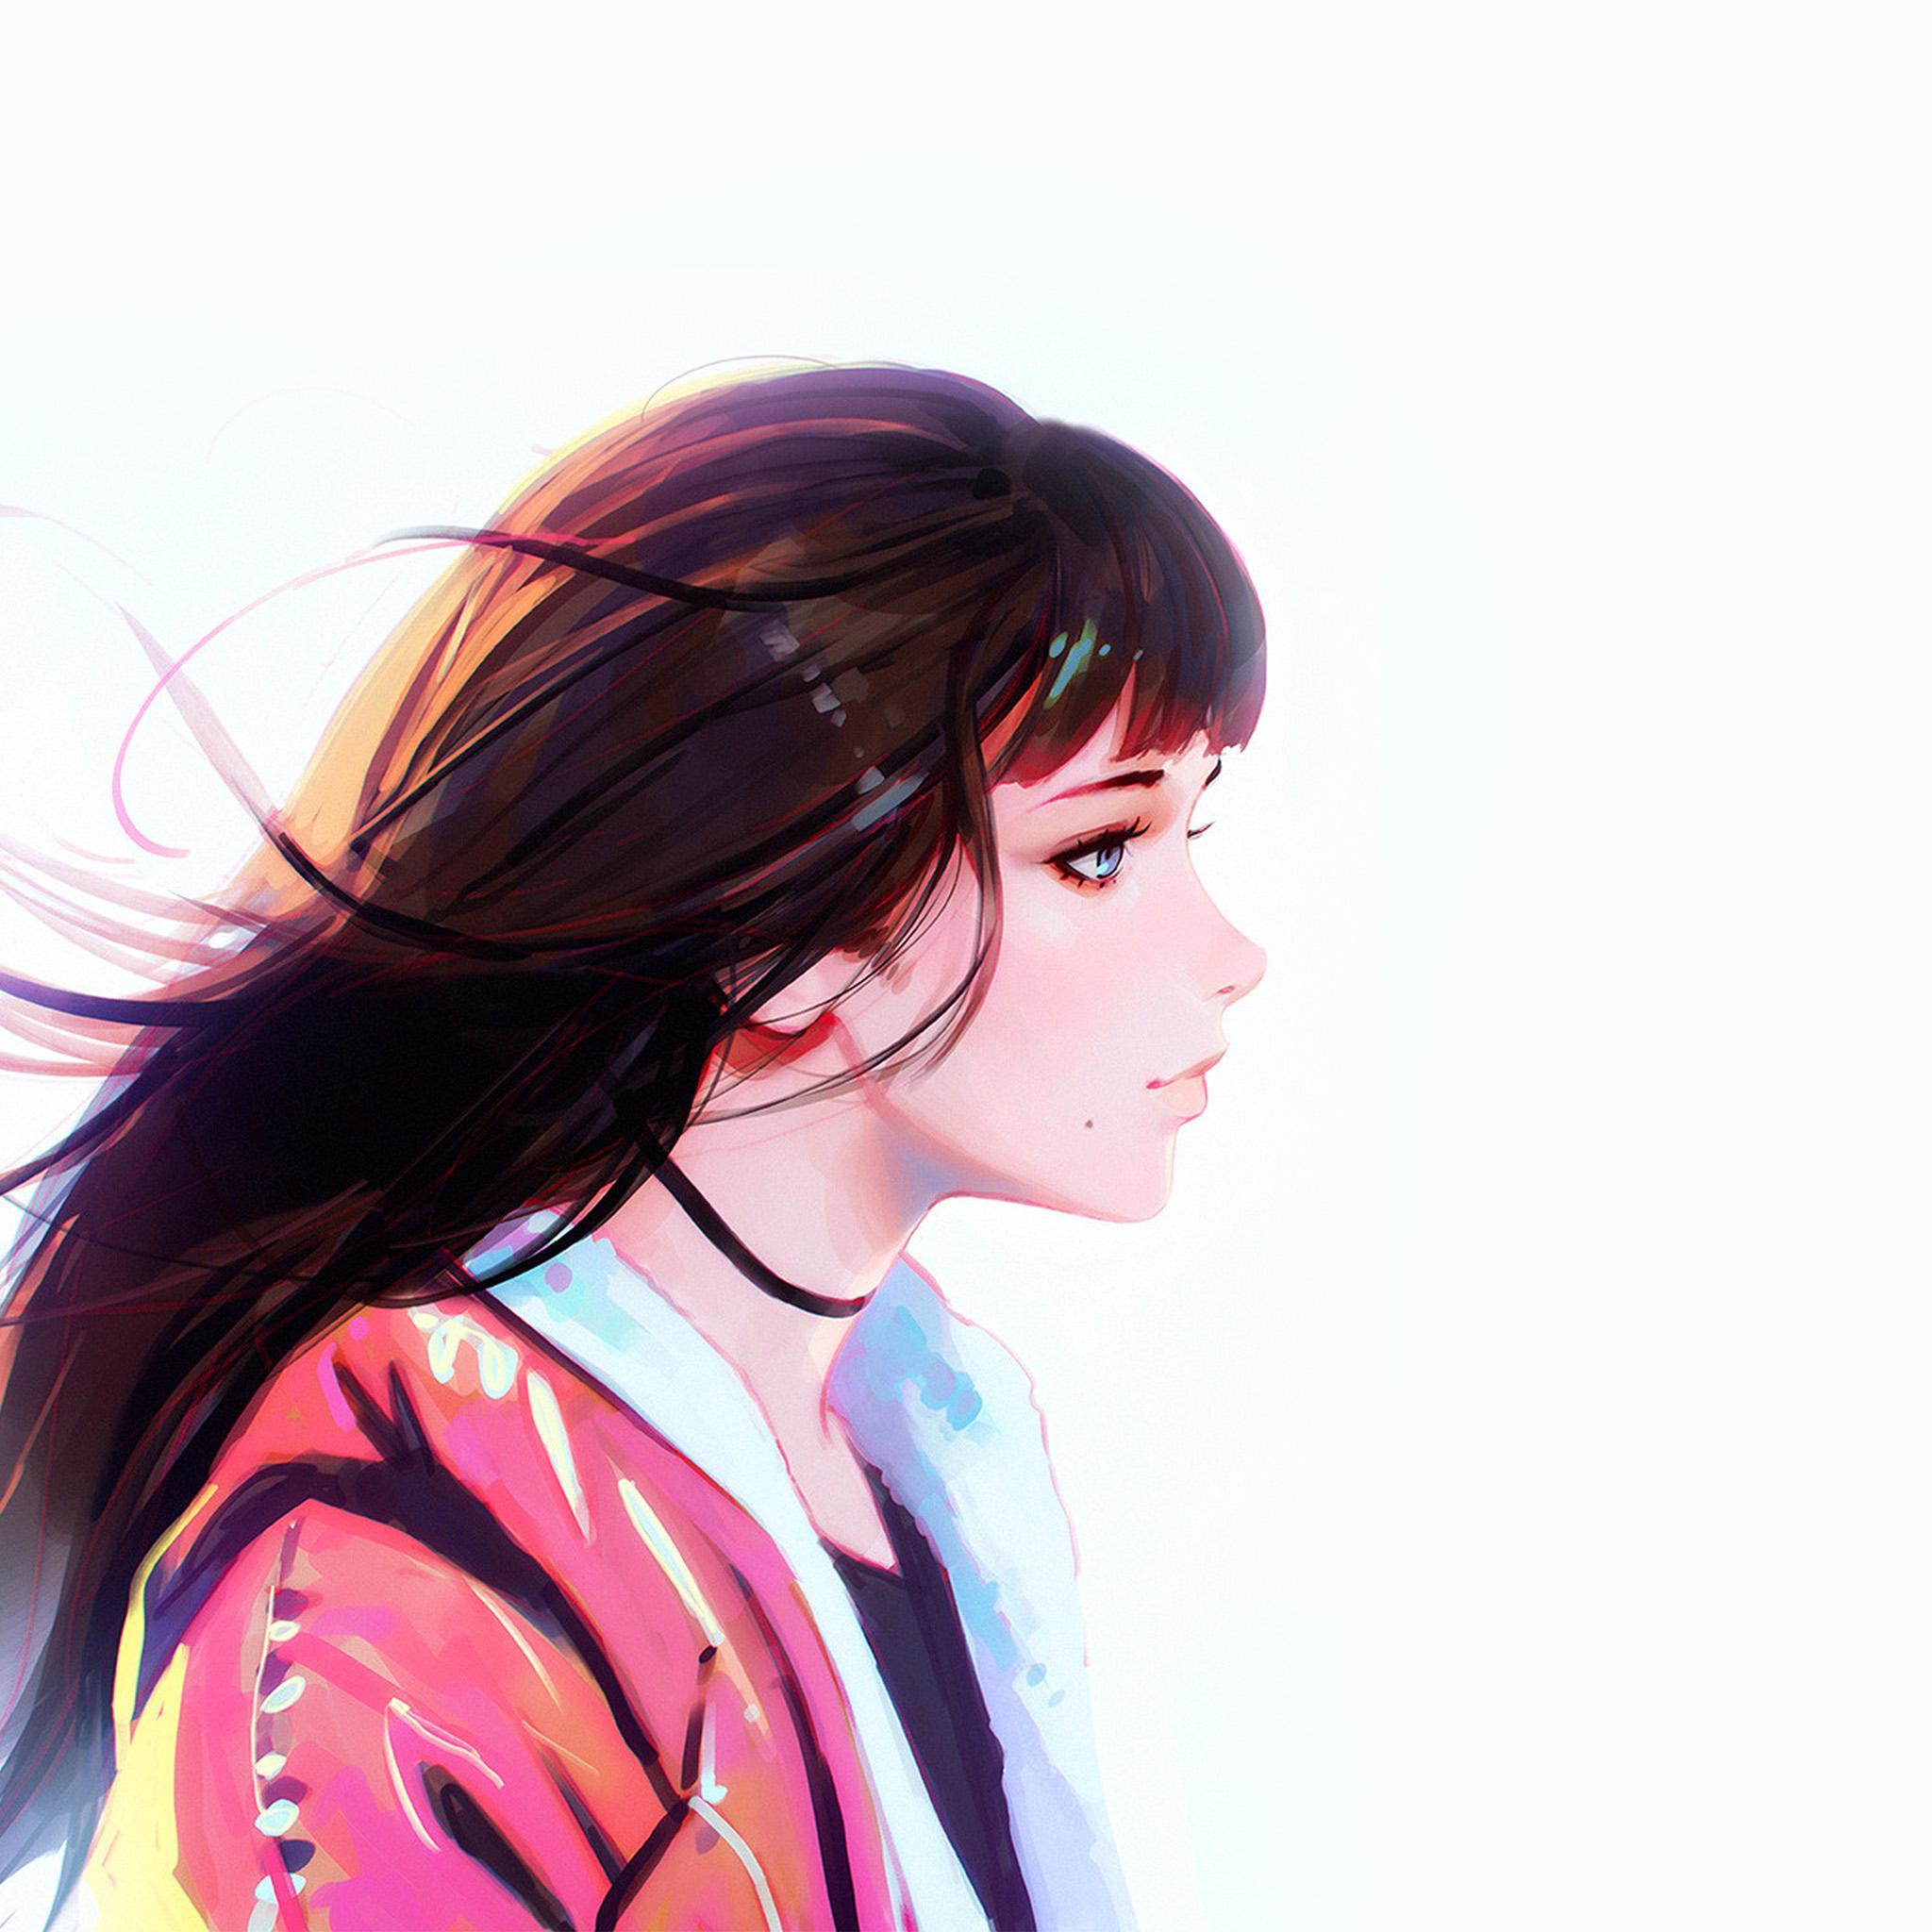 Bd28-girl-anime-drawing-painting-ilya-art-illustration